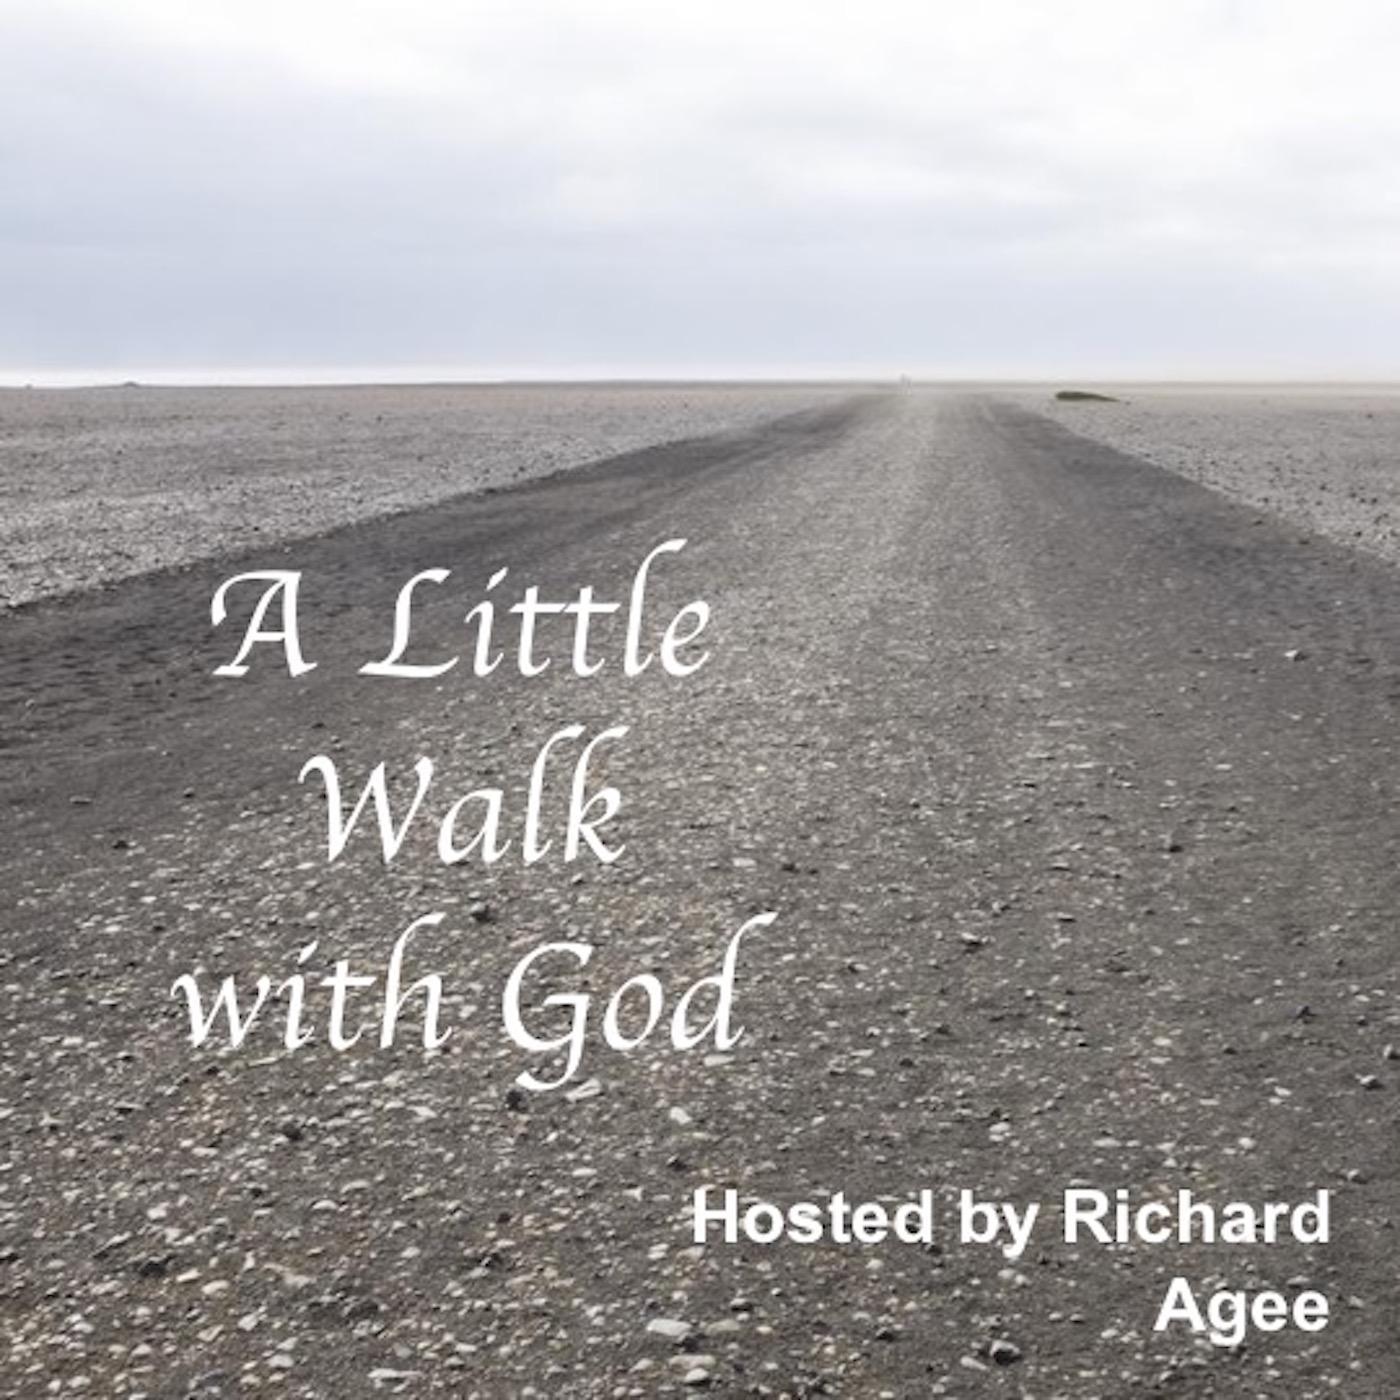 Artwork for The source of David's deliverance - Episode 110, Apr 20, 2015